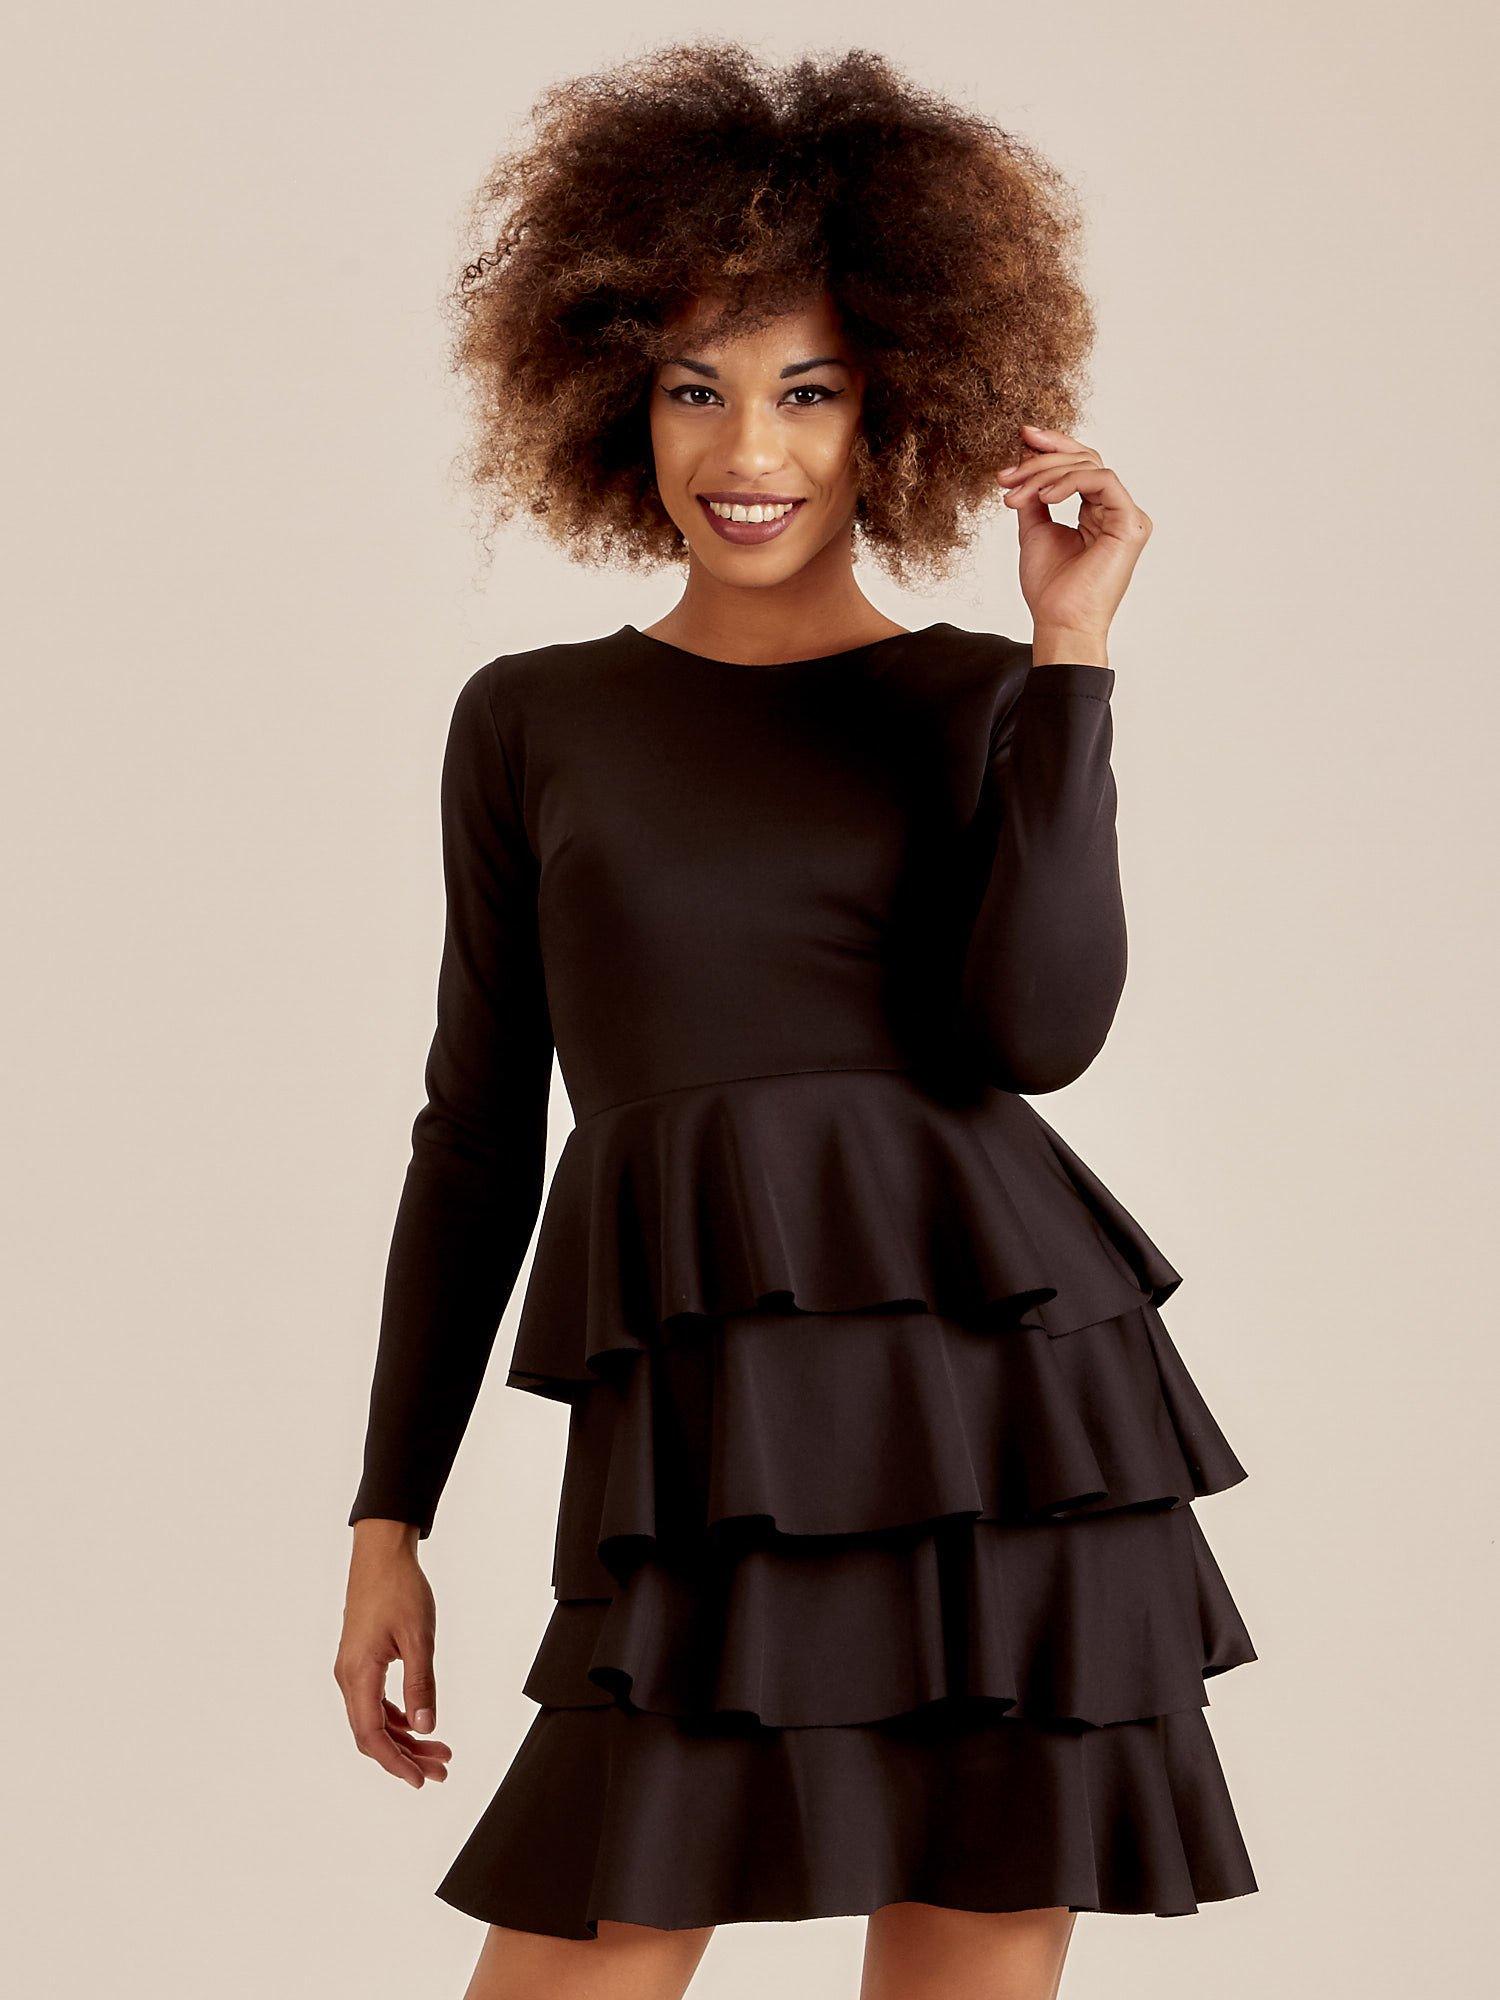 90d5c4f08d Czarna sukienka z warstwowymi falbanami - Sukienka koktajlowa - sklep  eButik.pl